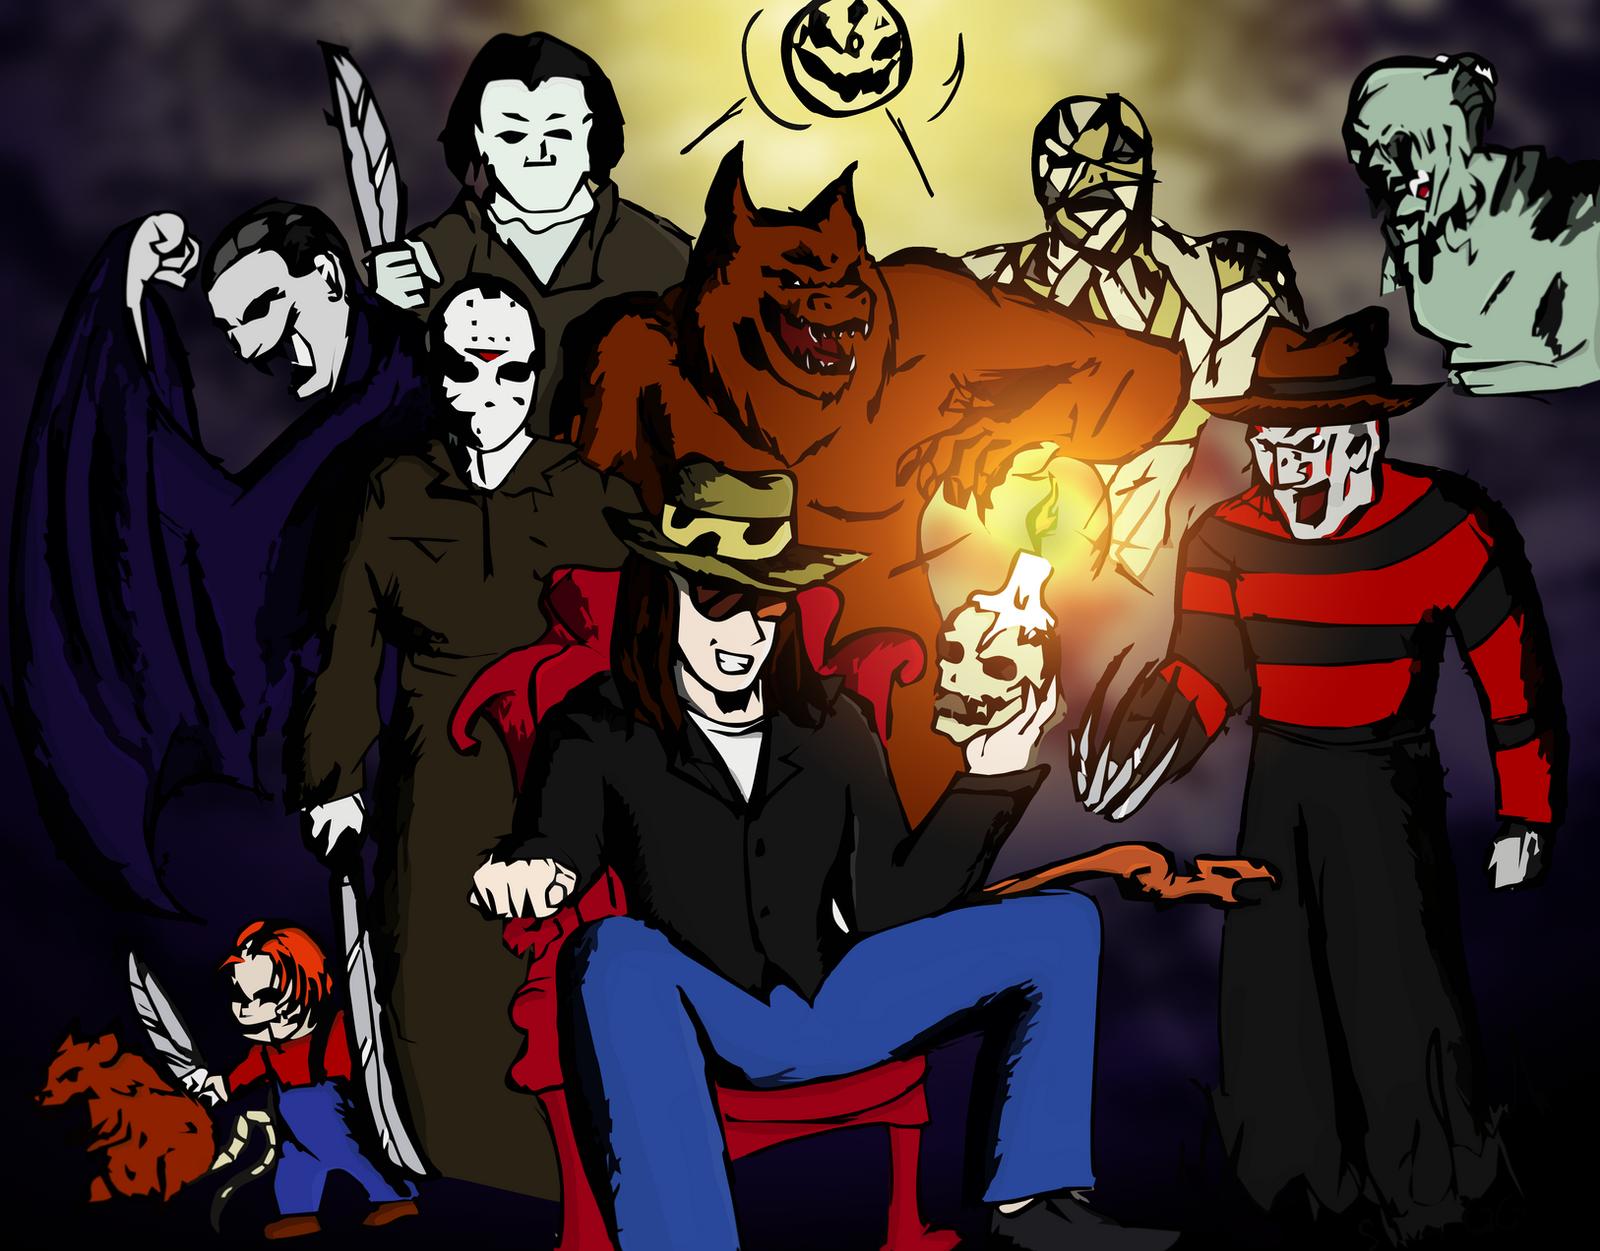 Dross y personajes de terror by tansolofrikis